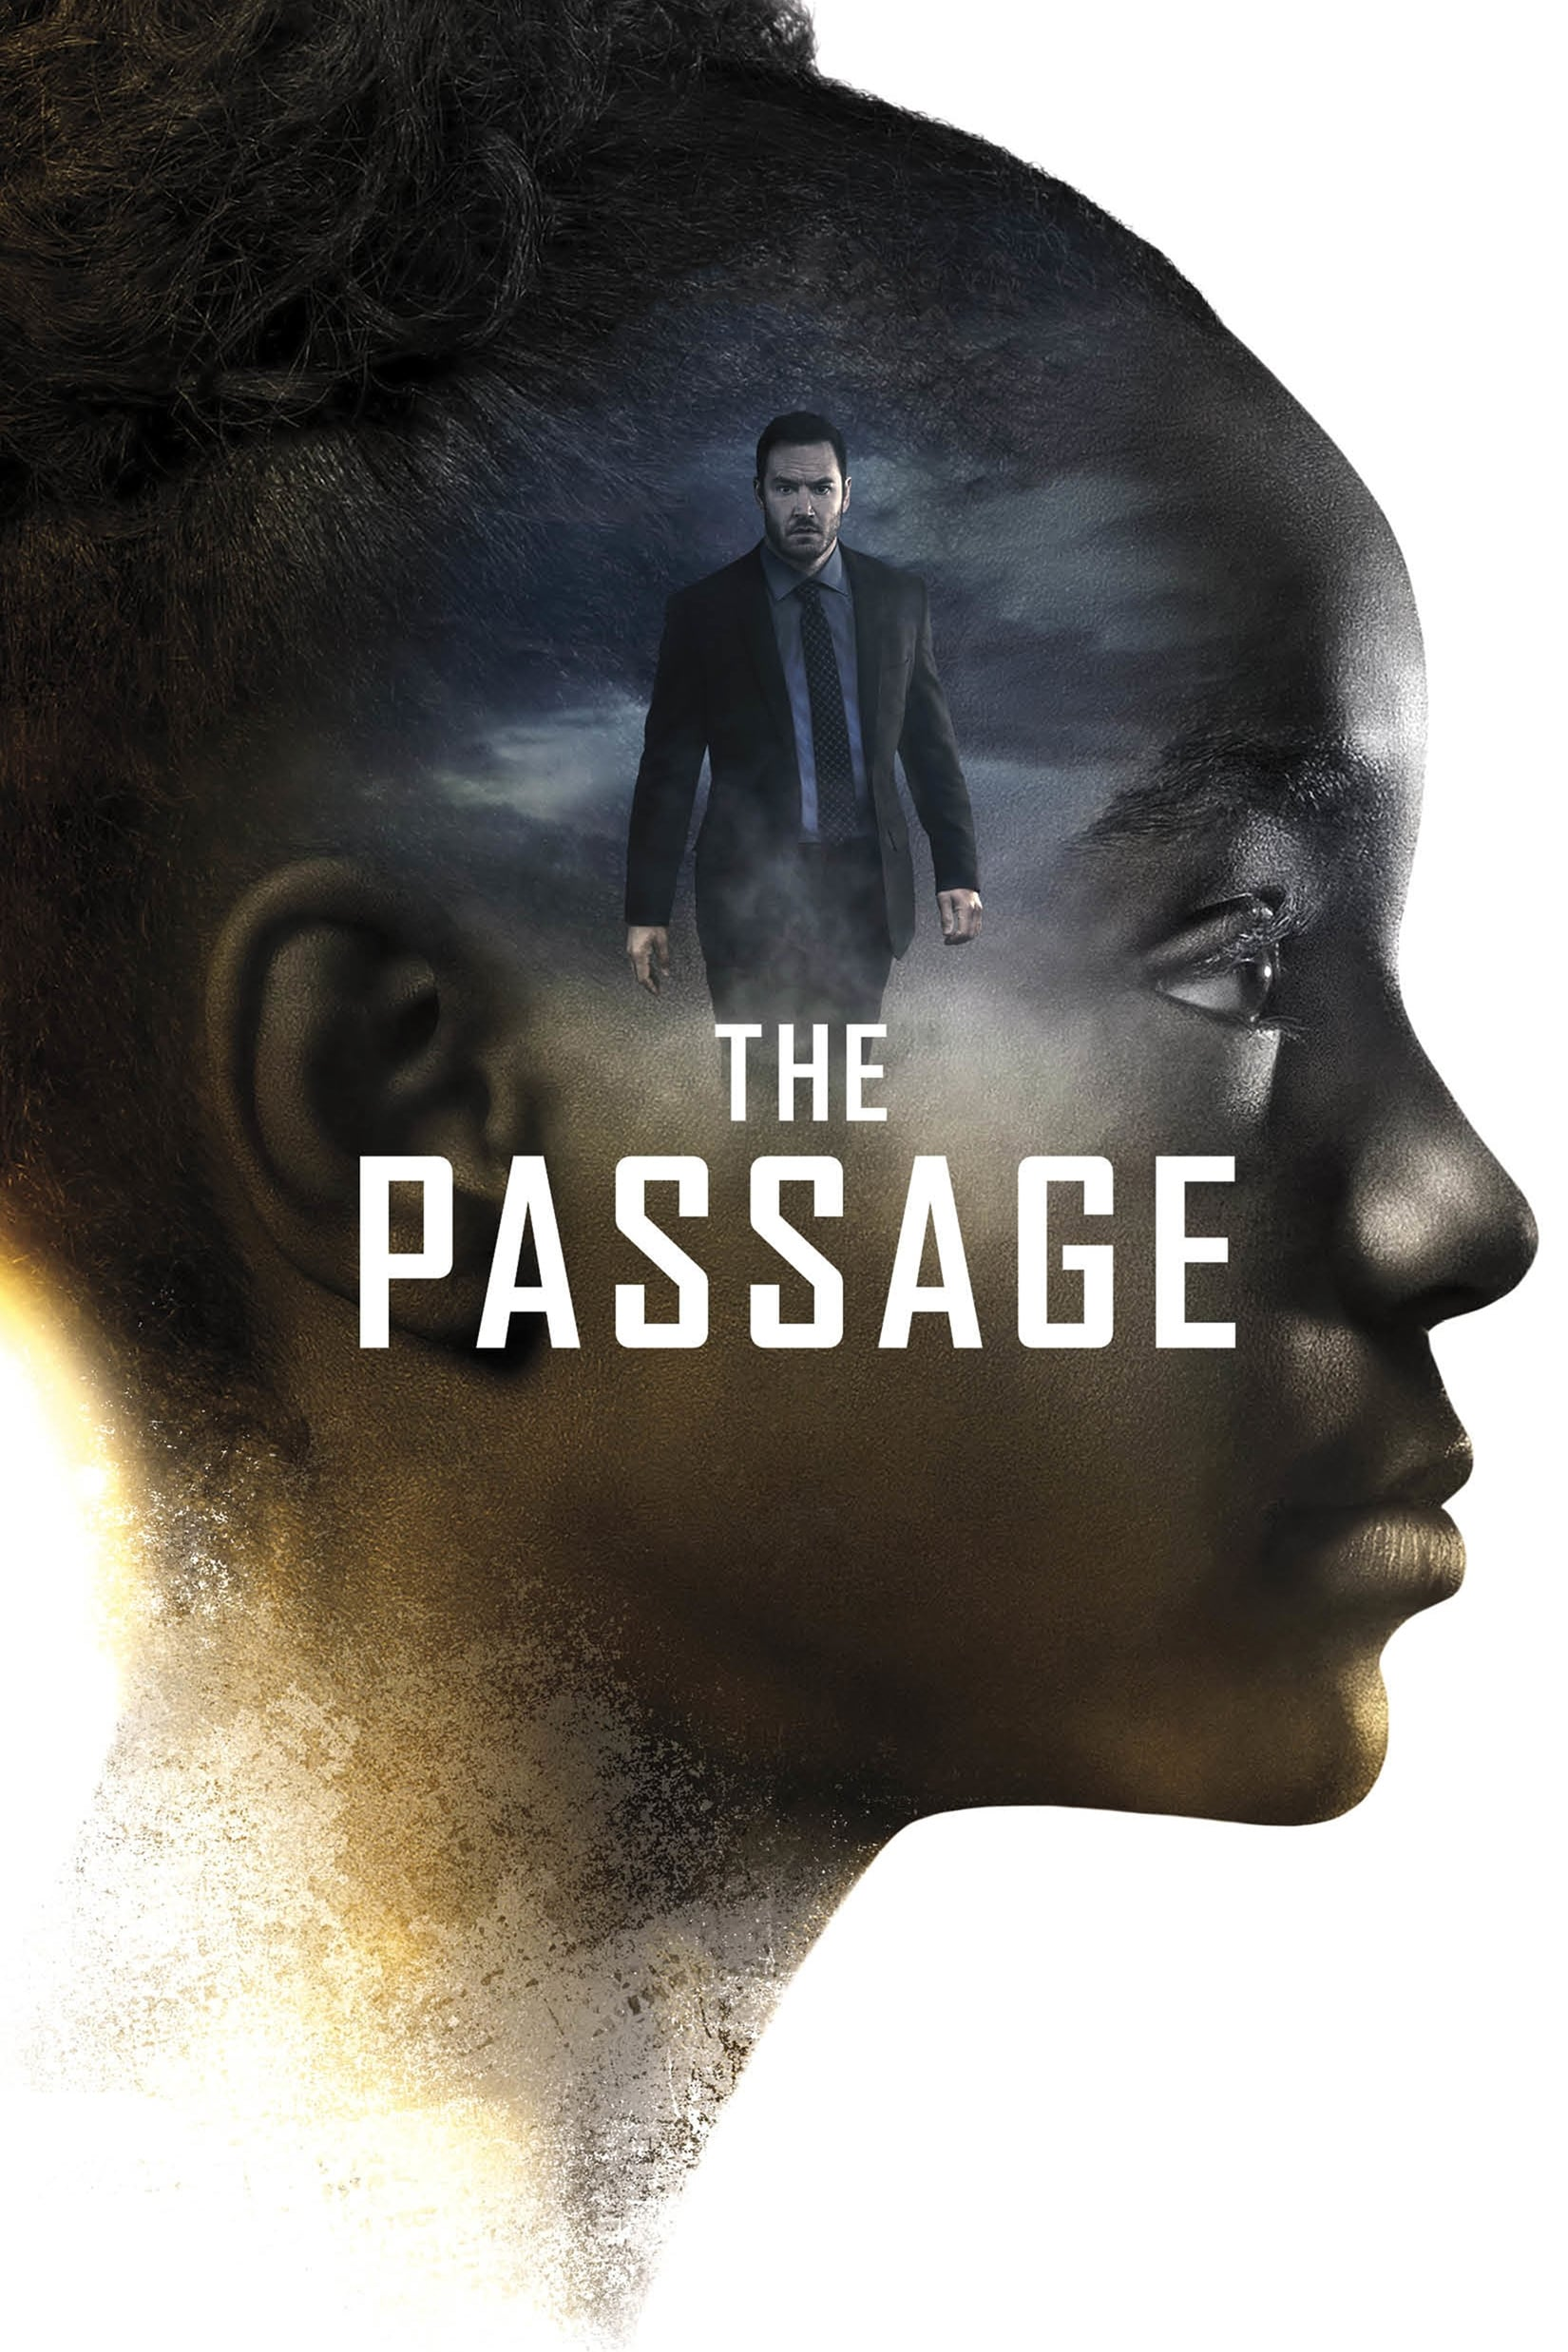 watch The Passage series 2019 online free